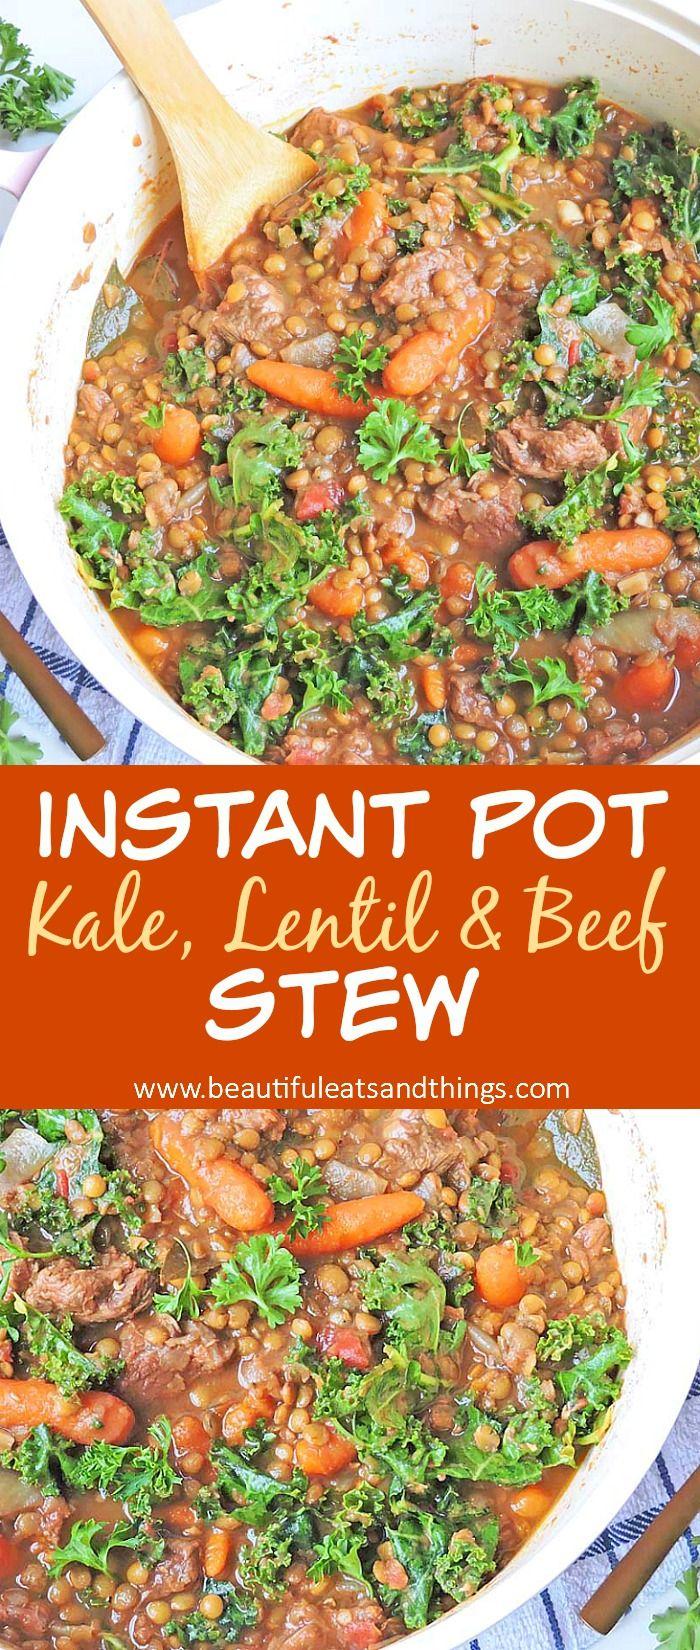 Kale Lentil and Beef Stew